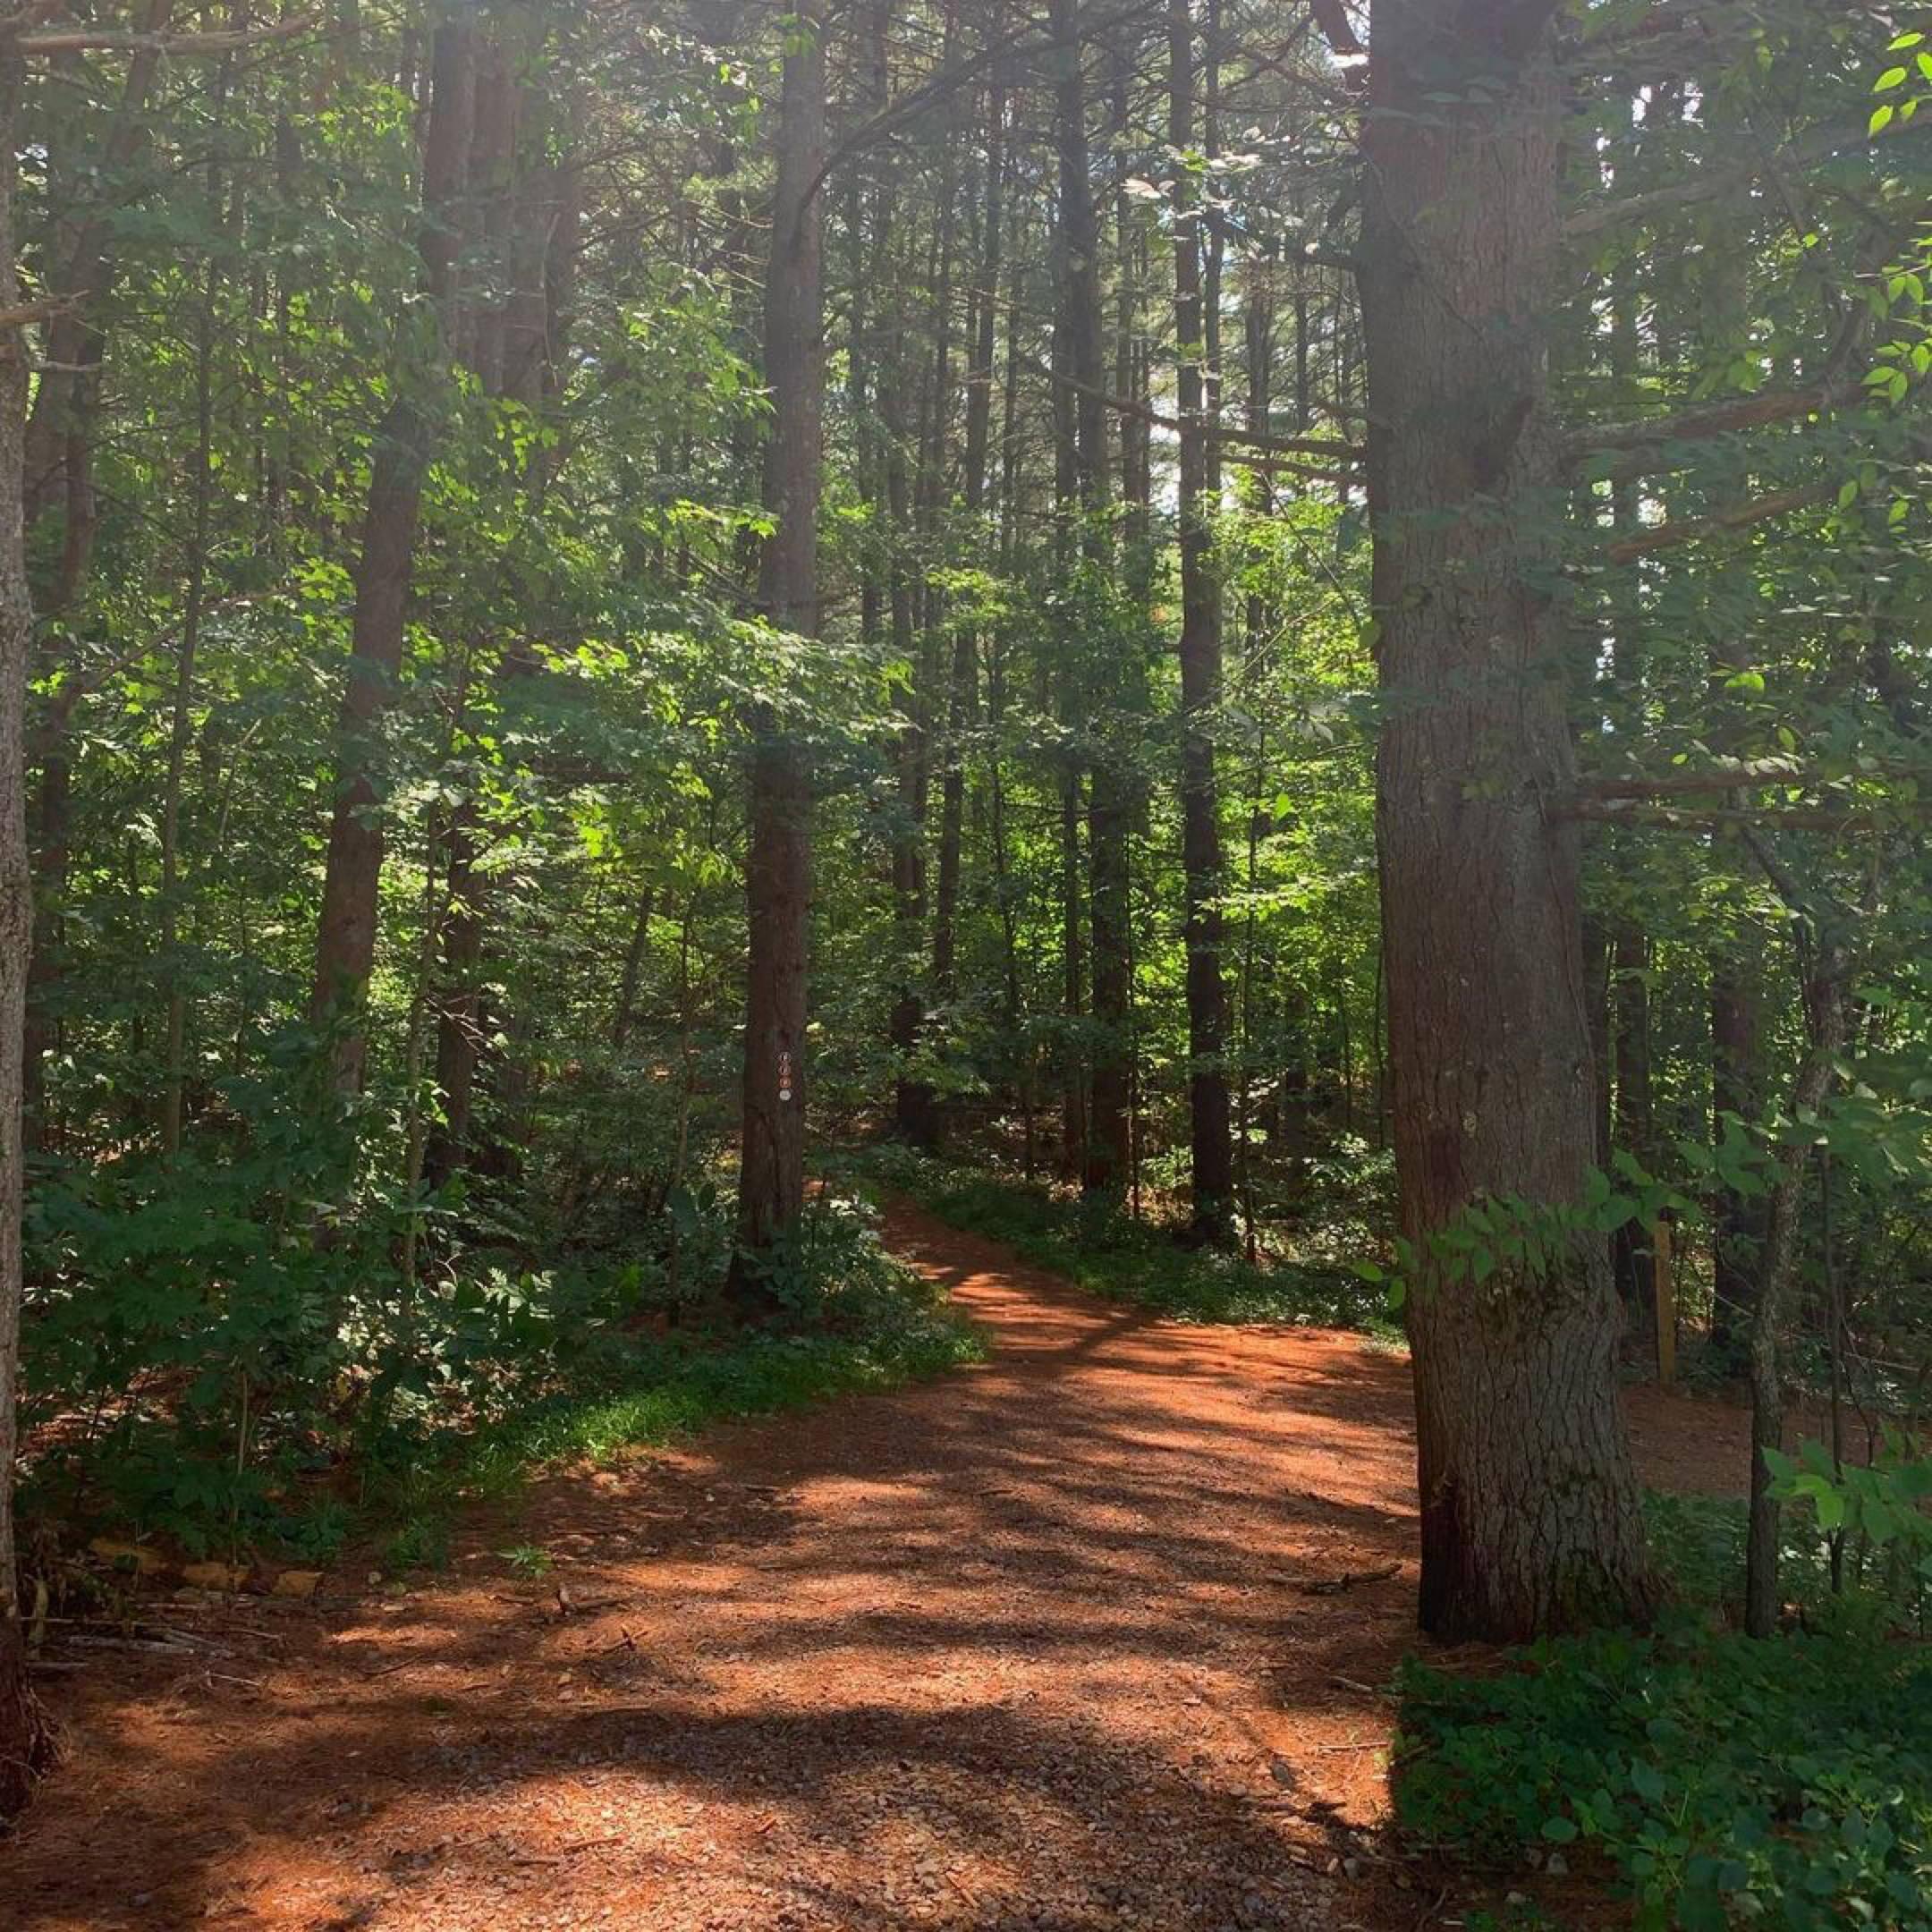 Bear Run Trail near Mill Run, Ohiopyle, and Fallingwater